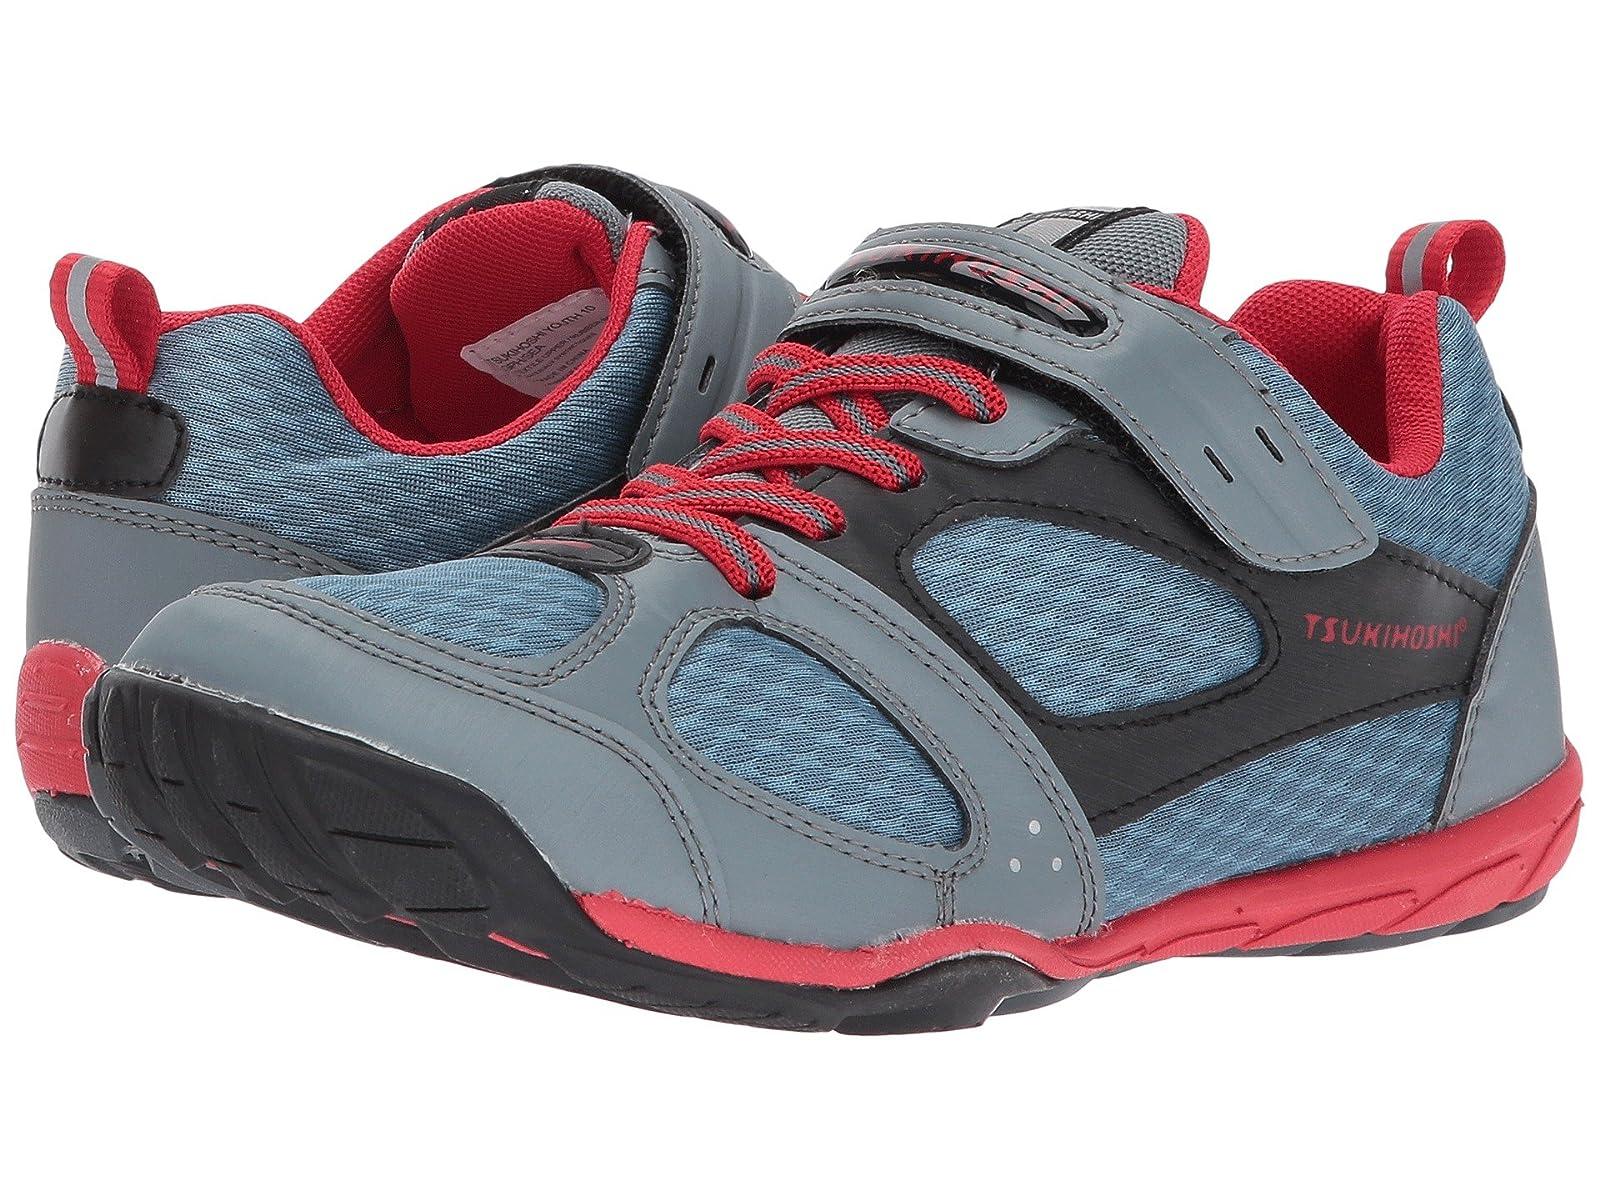 Tsukihoshi Kids Mako H&L 2 (Little Kid/Big Kid)Atmospheric grades have affordable shoes